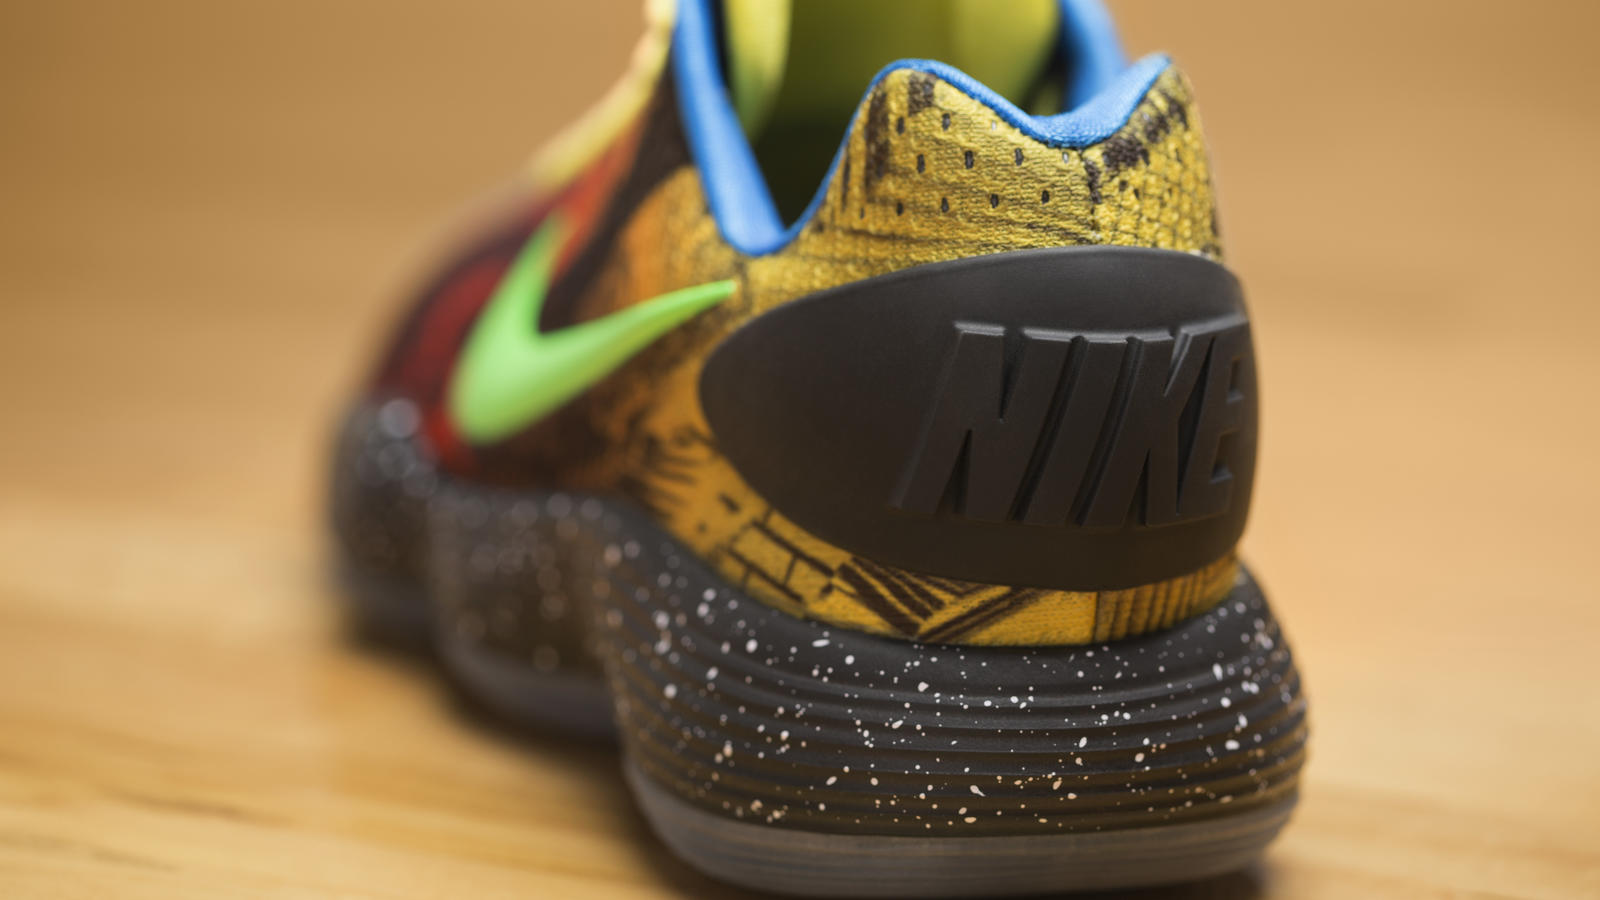 79910d0afbf1 Six New Nike Hyperdunk Low Styles Celebrate Basketball s Global ...